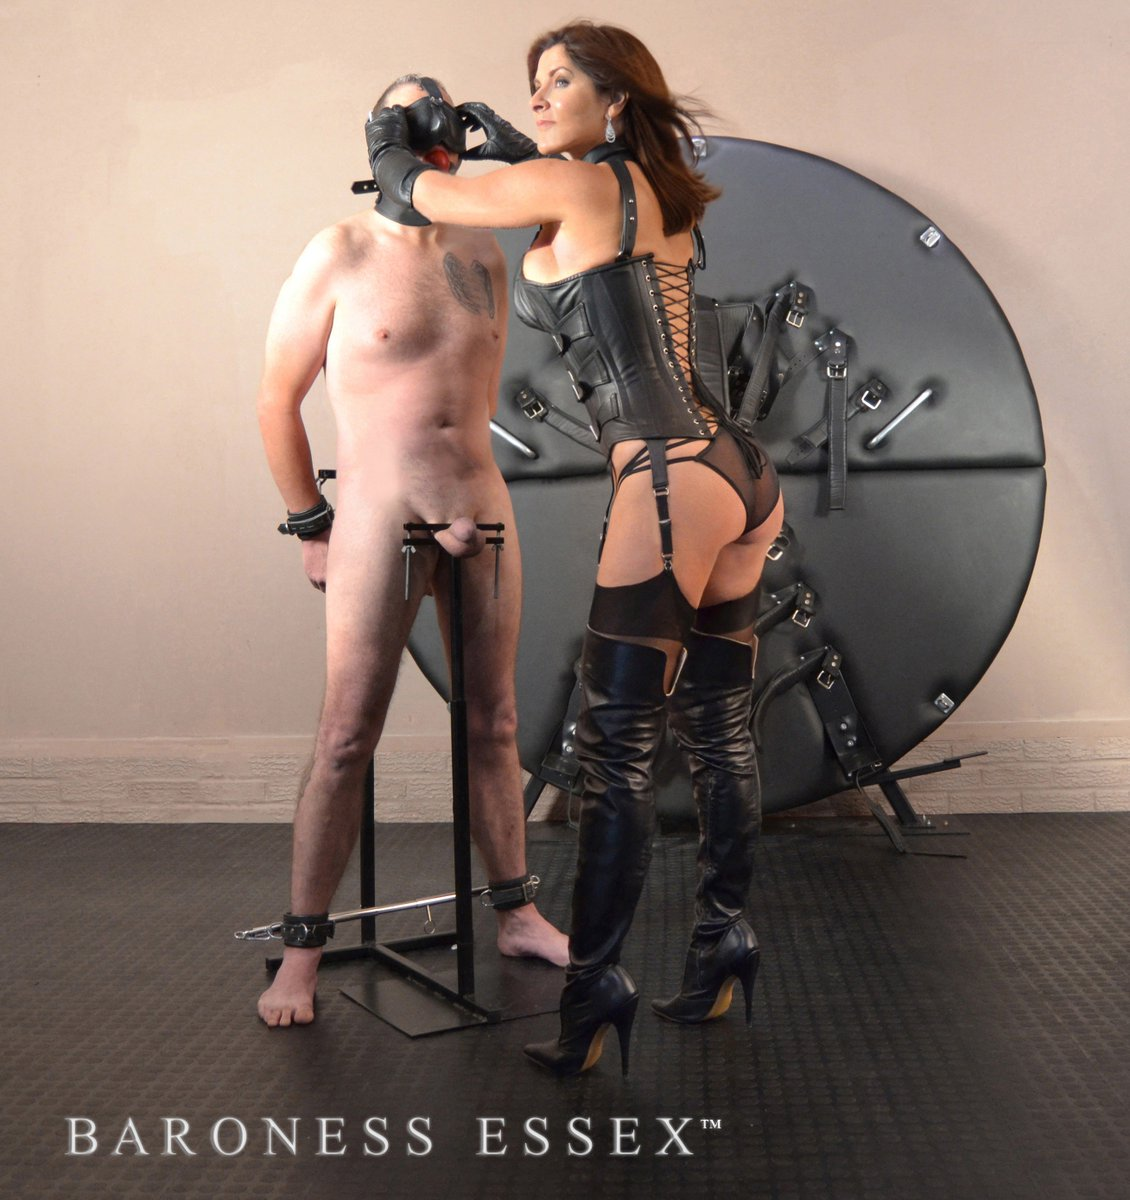 Bdsm Femdom Porn Images, Pics, Clips